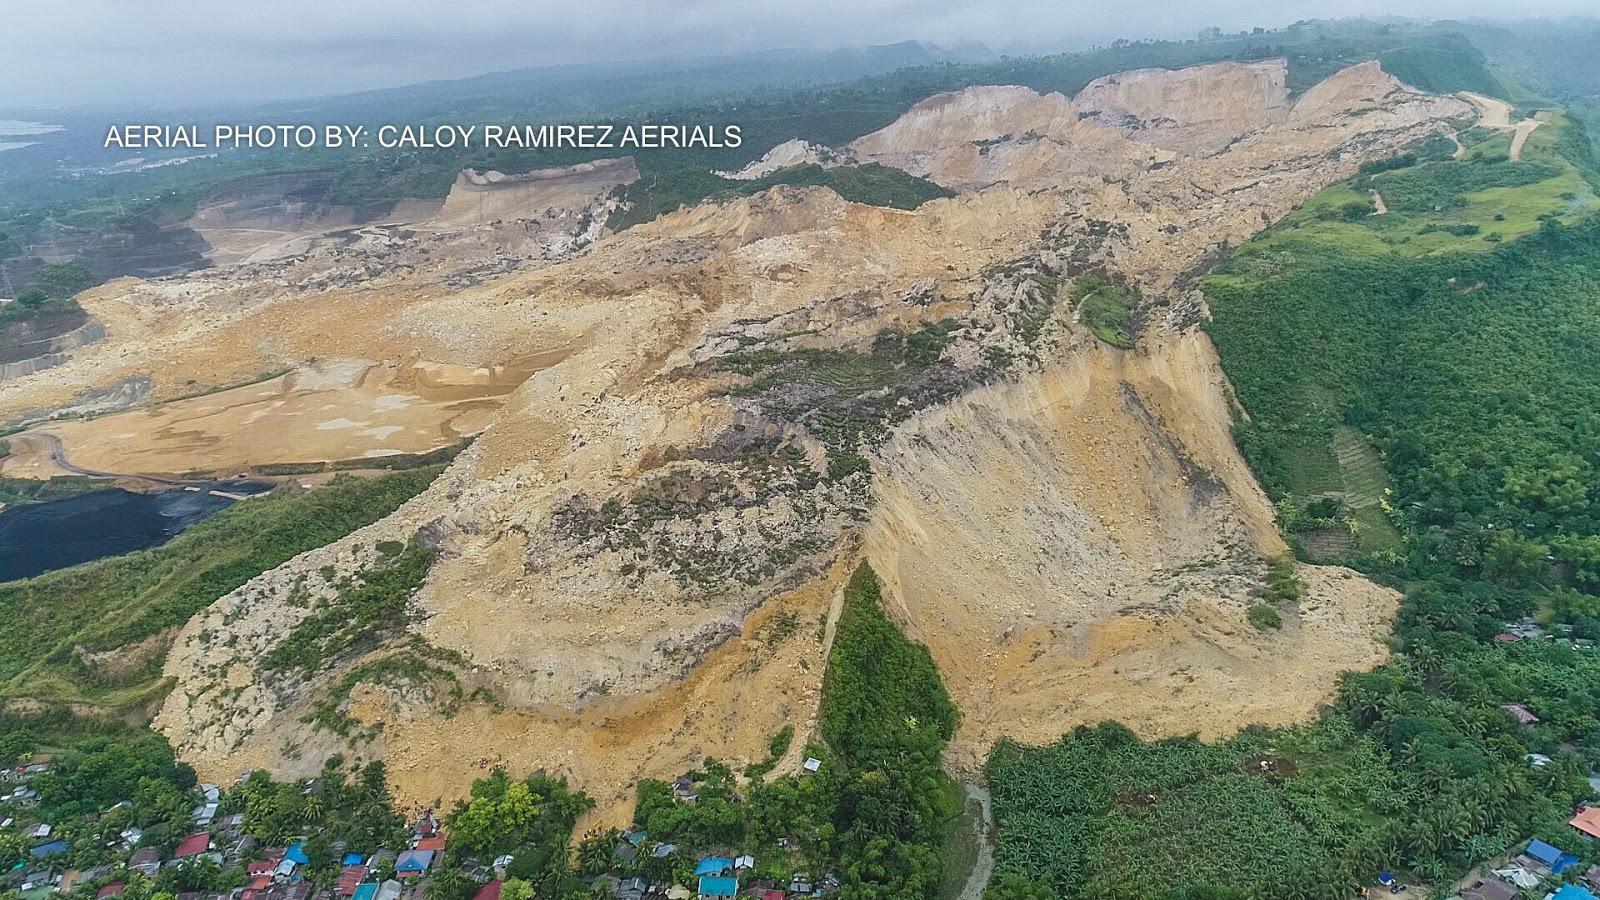 Landslide hits Naga, Cebu - 3 dead, dozens of homes buried | Asian Policy